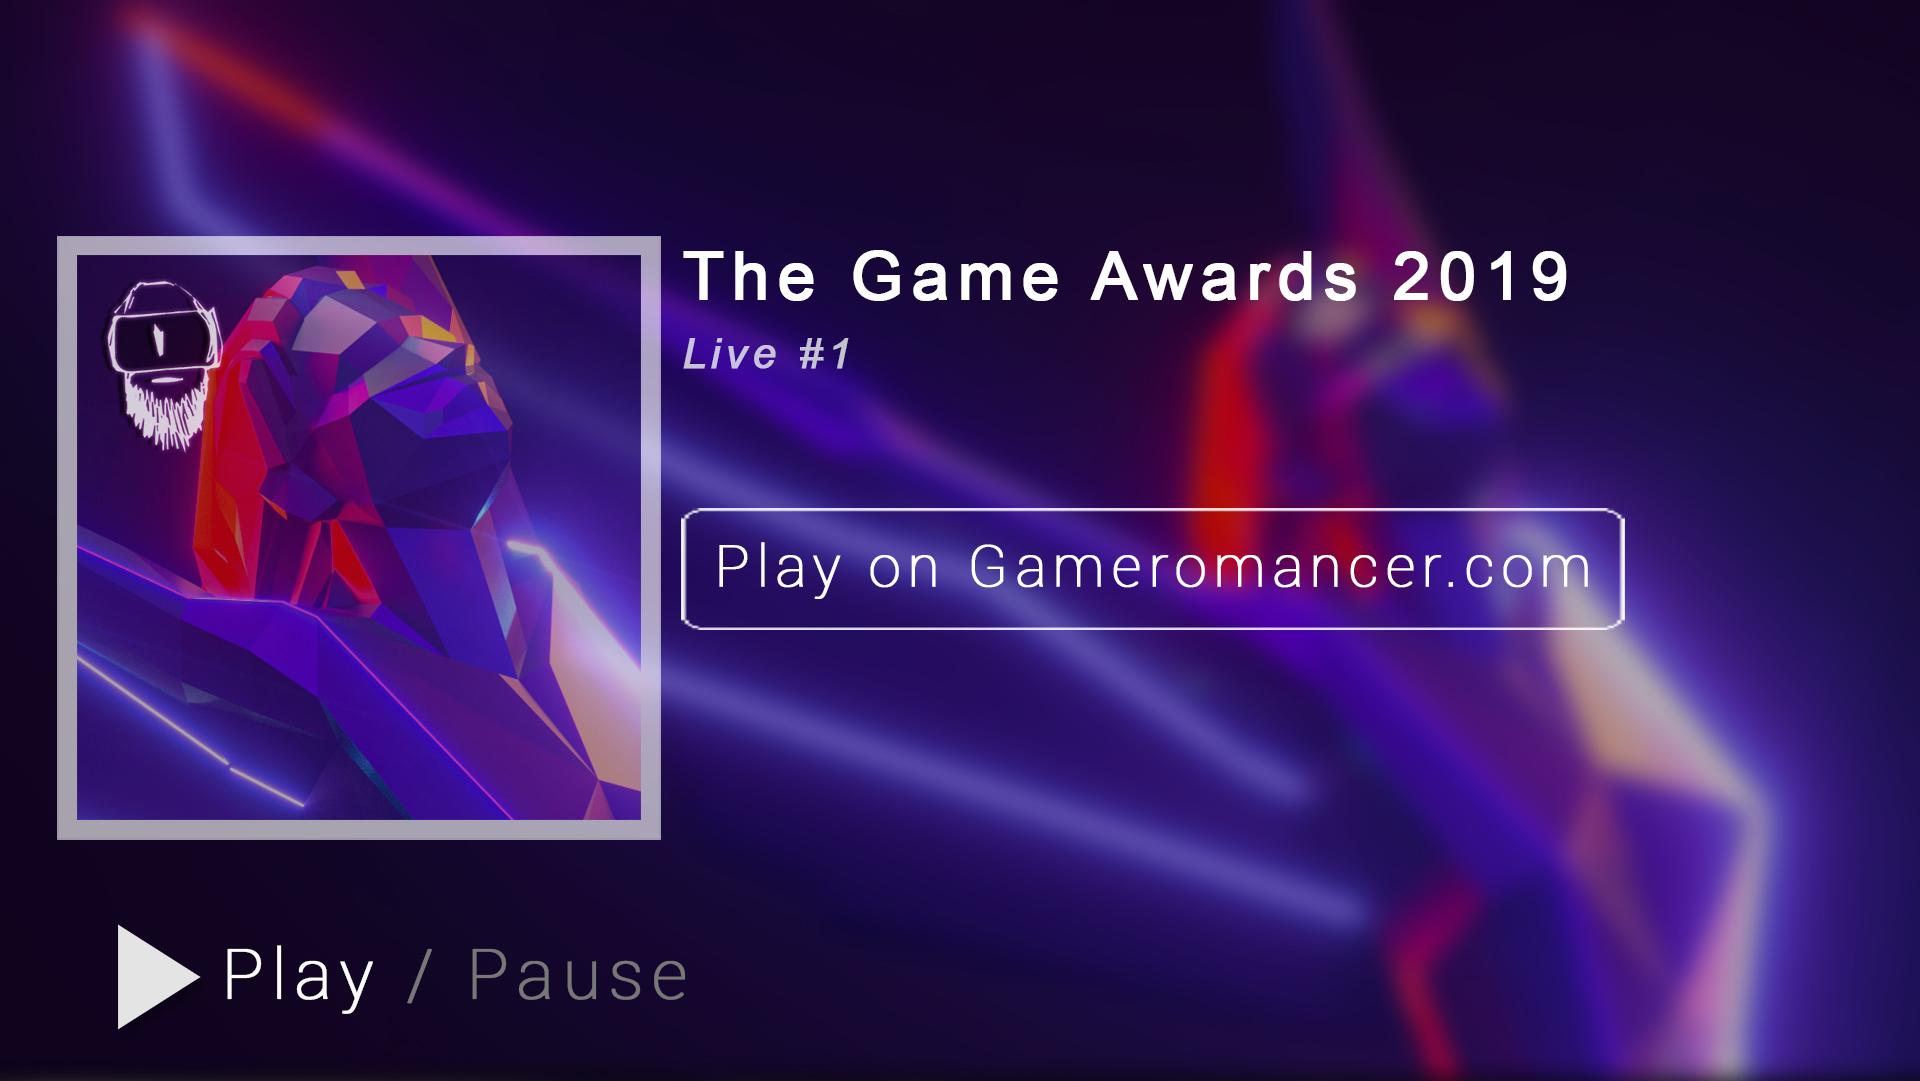 Live #1: Bomba ai Game Awards, i Green Day sono ancora vivi!